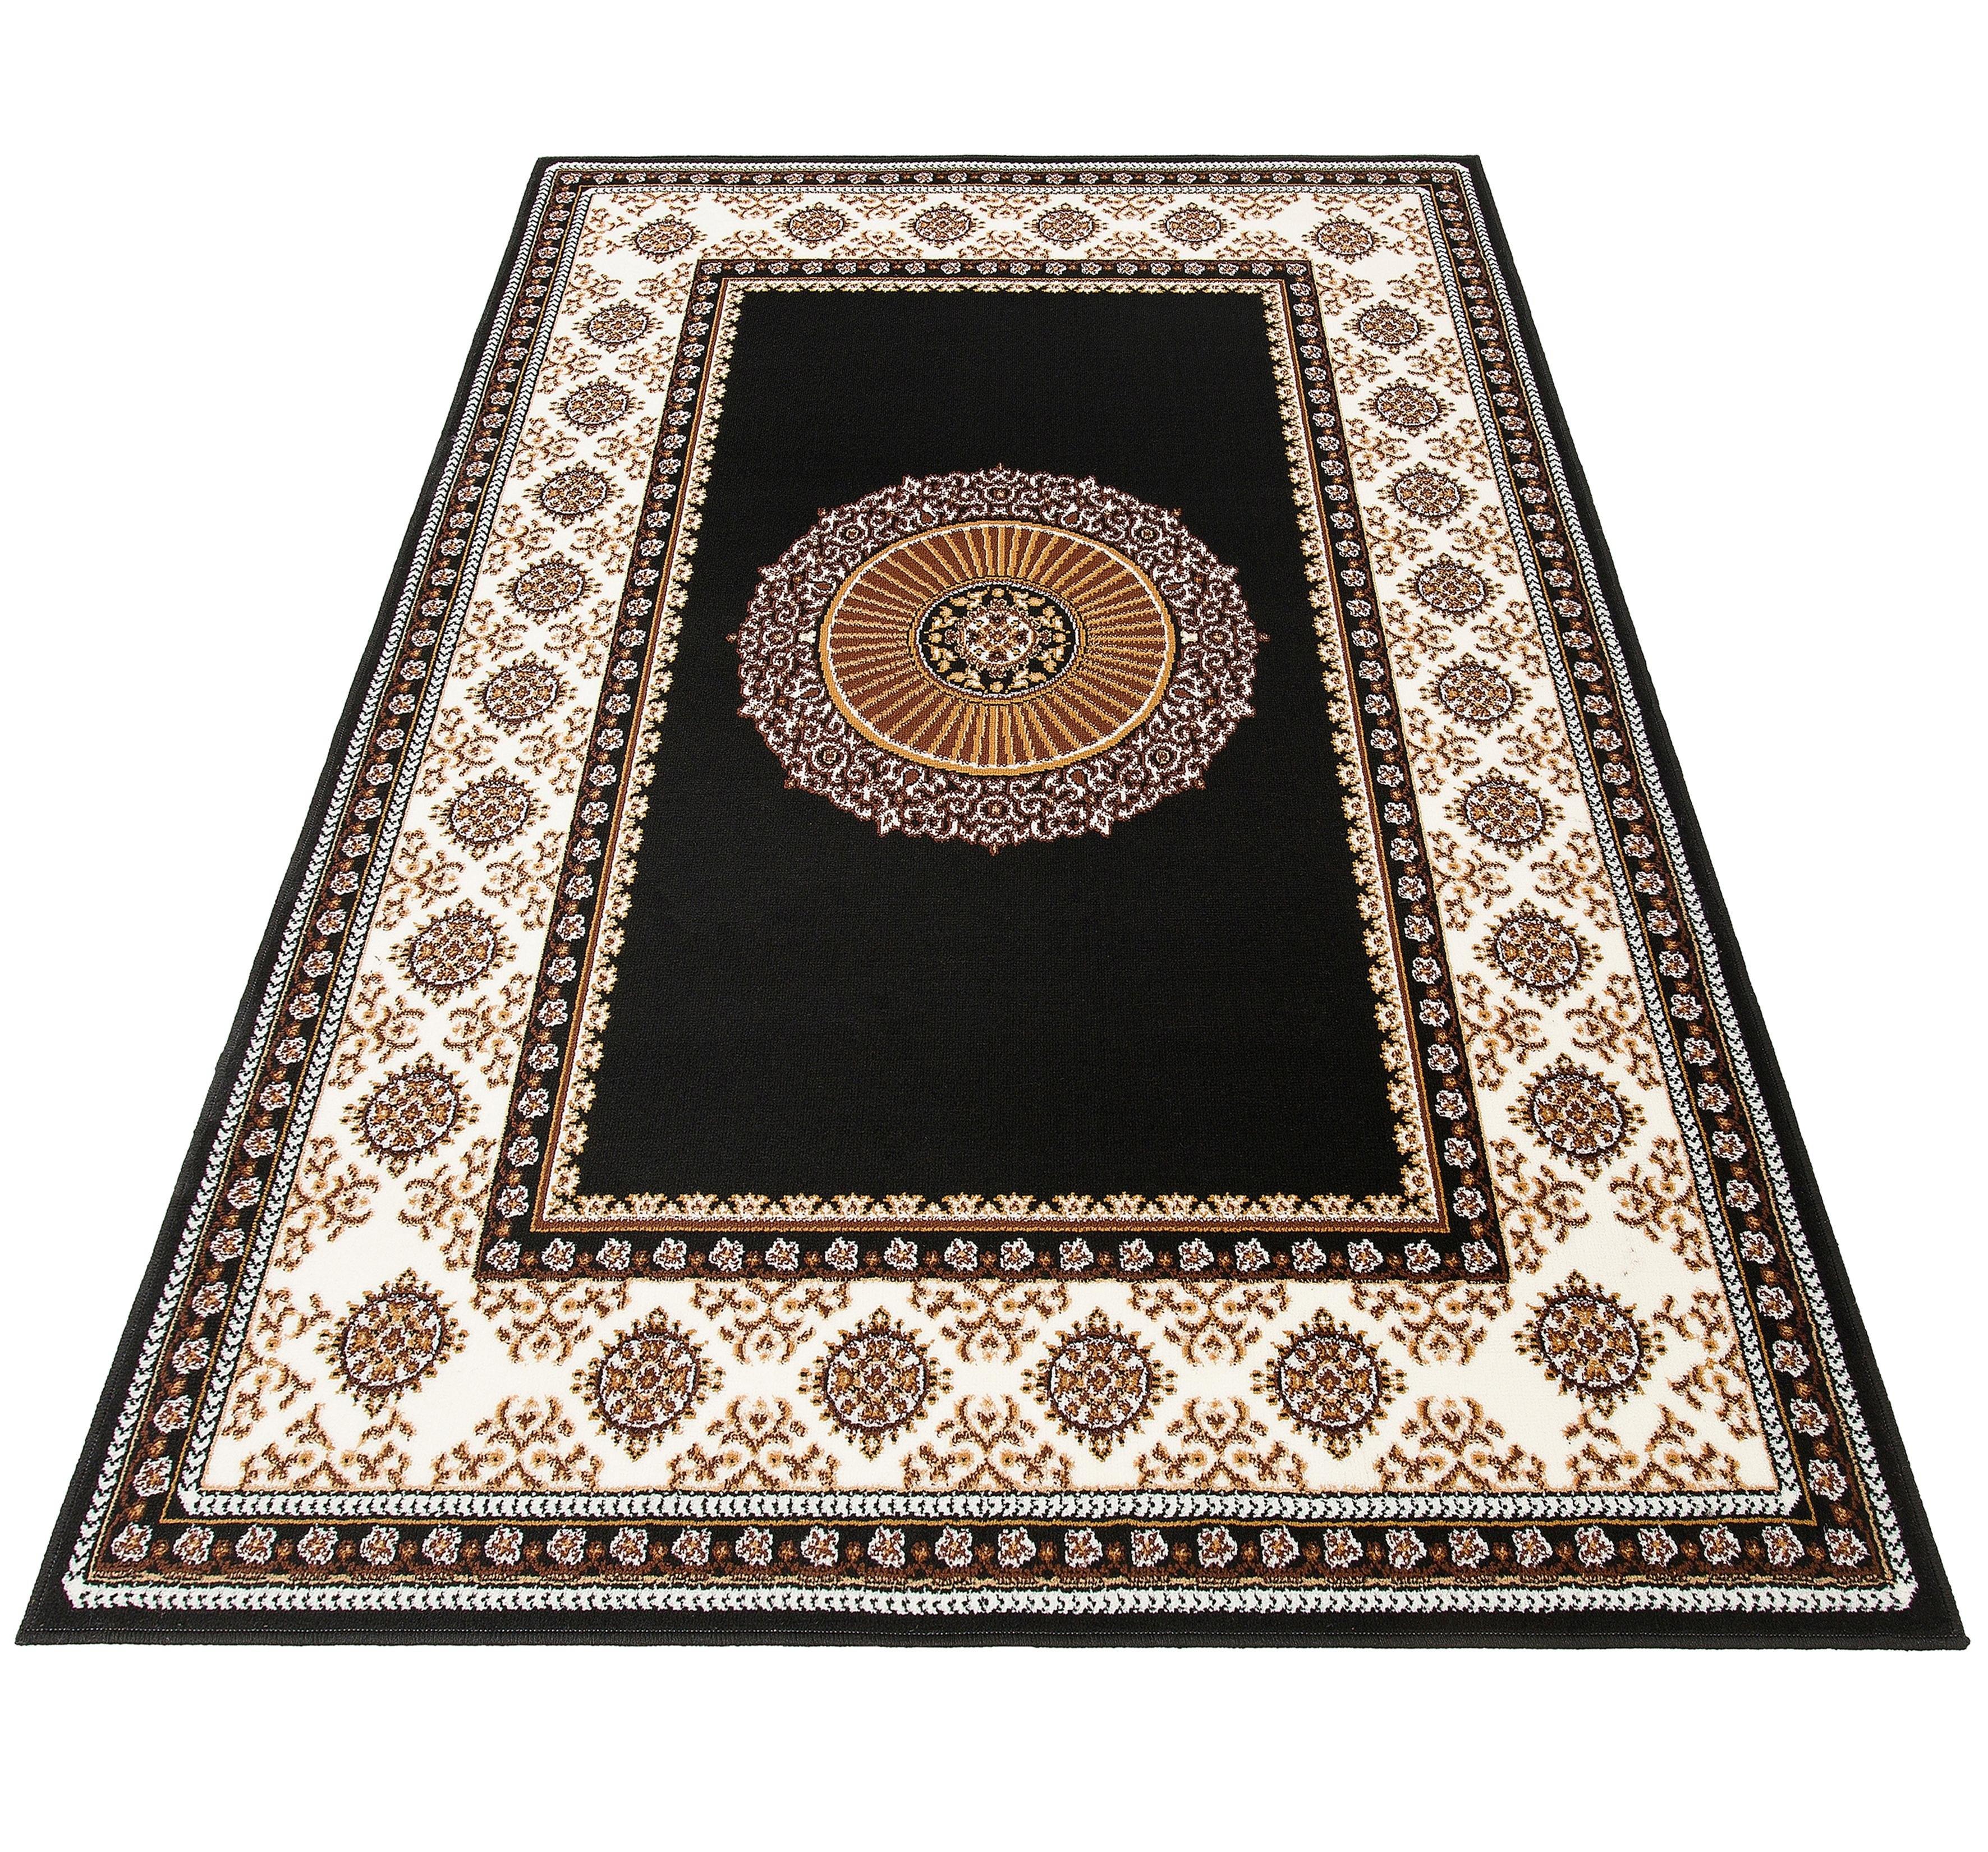 DELAVITA vloerkleed Shari Oriënt-decor, woonkamer nu online bestellen